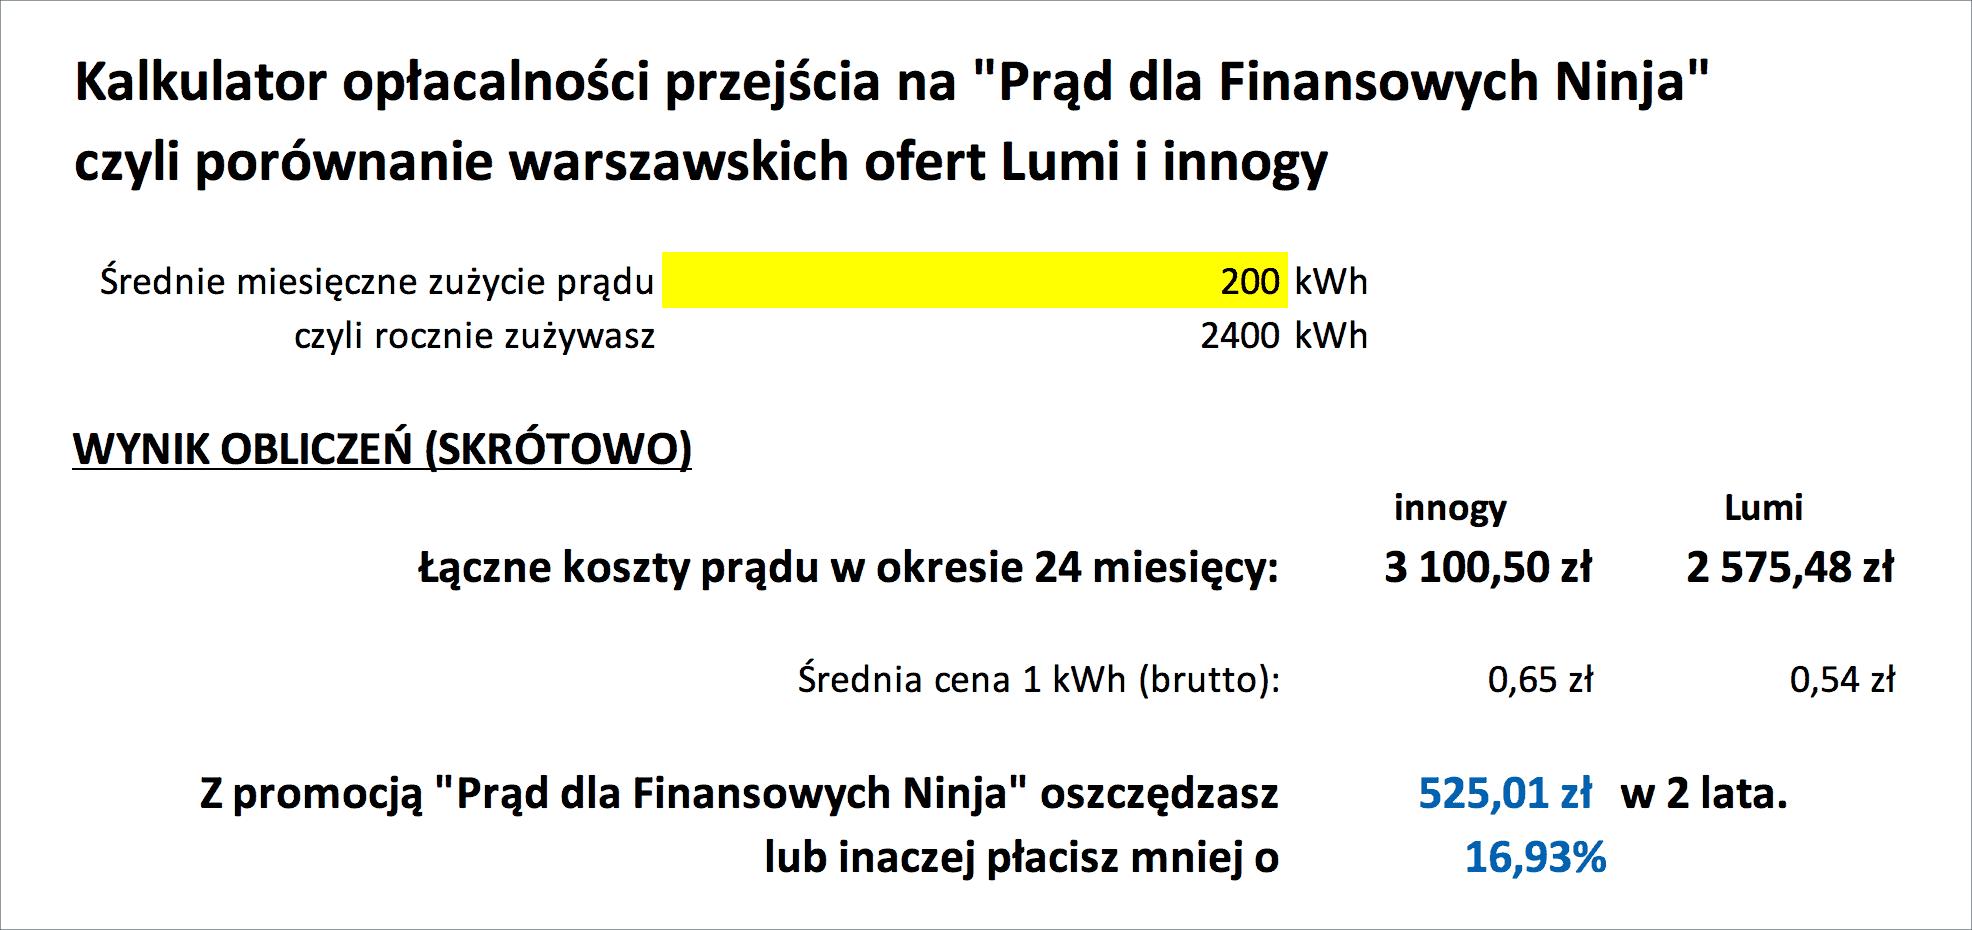 03-Prad-dla-Finansowych-Ninja-200-kWh-v4